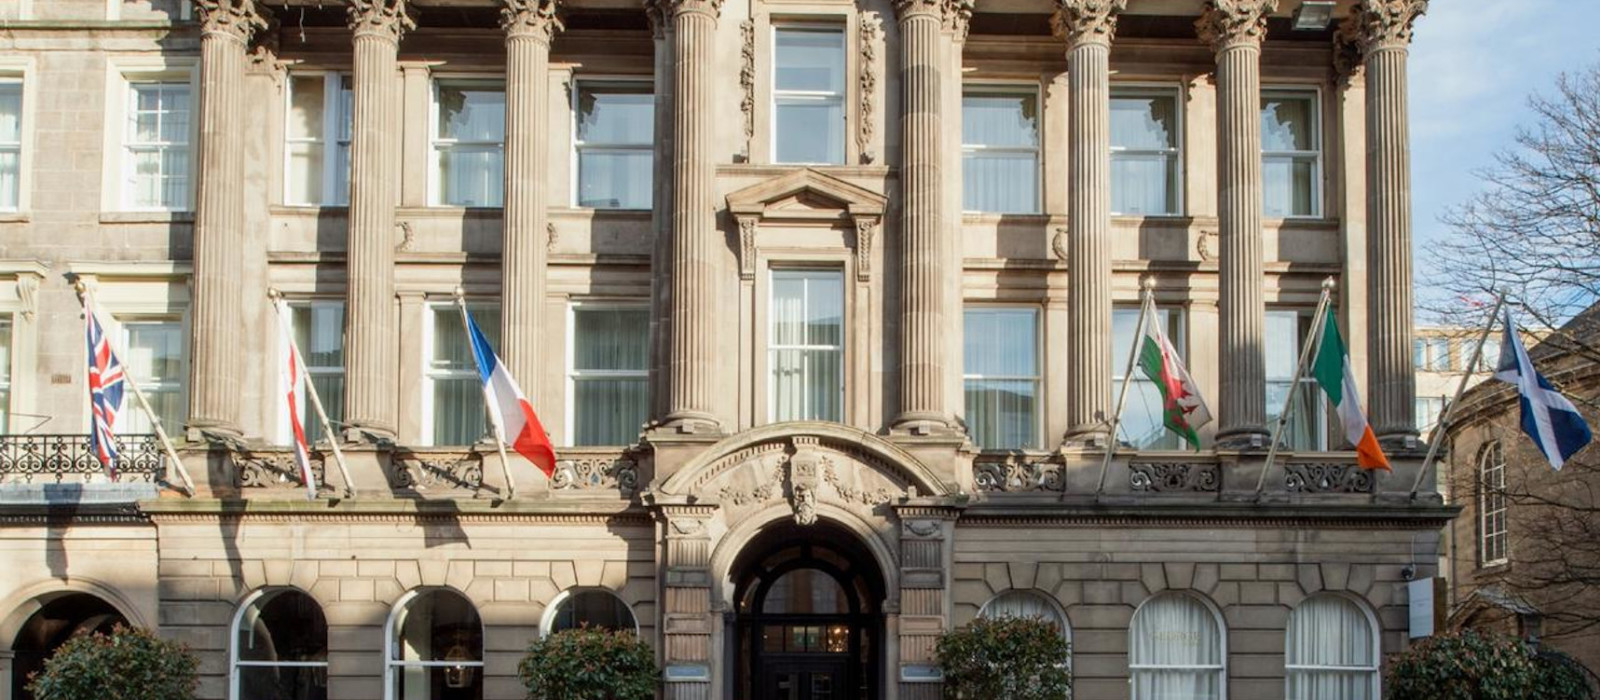 Hotel InterContinental Edinburgh The George  UK & Ireland